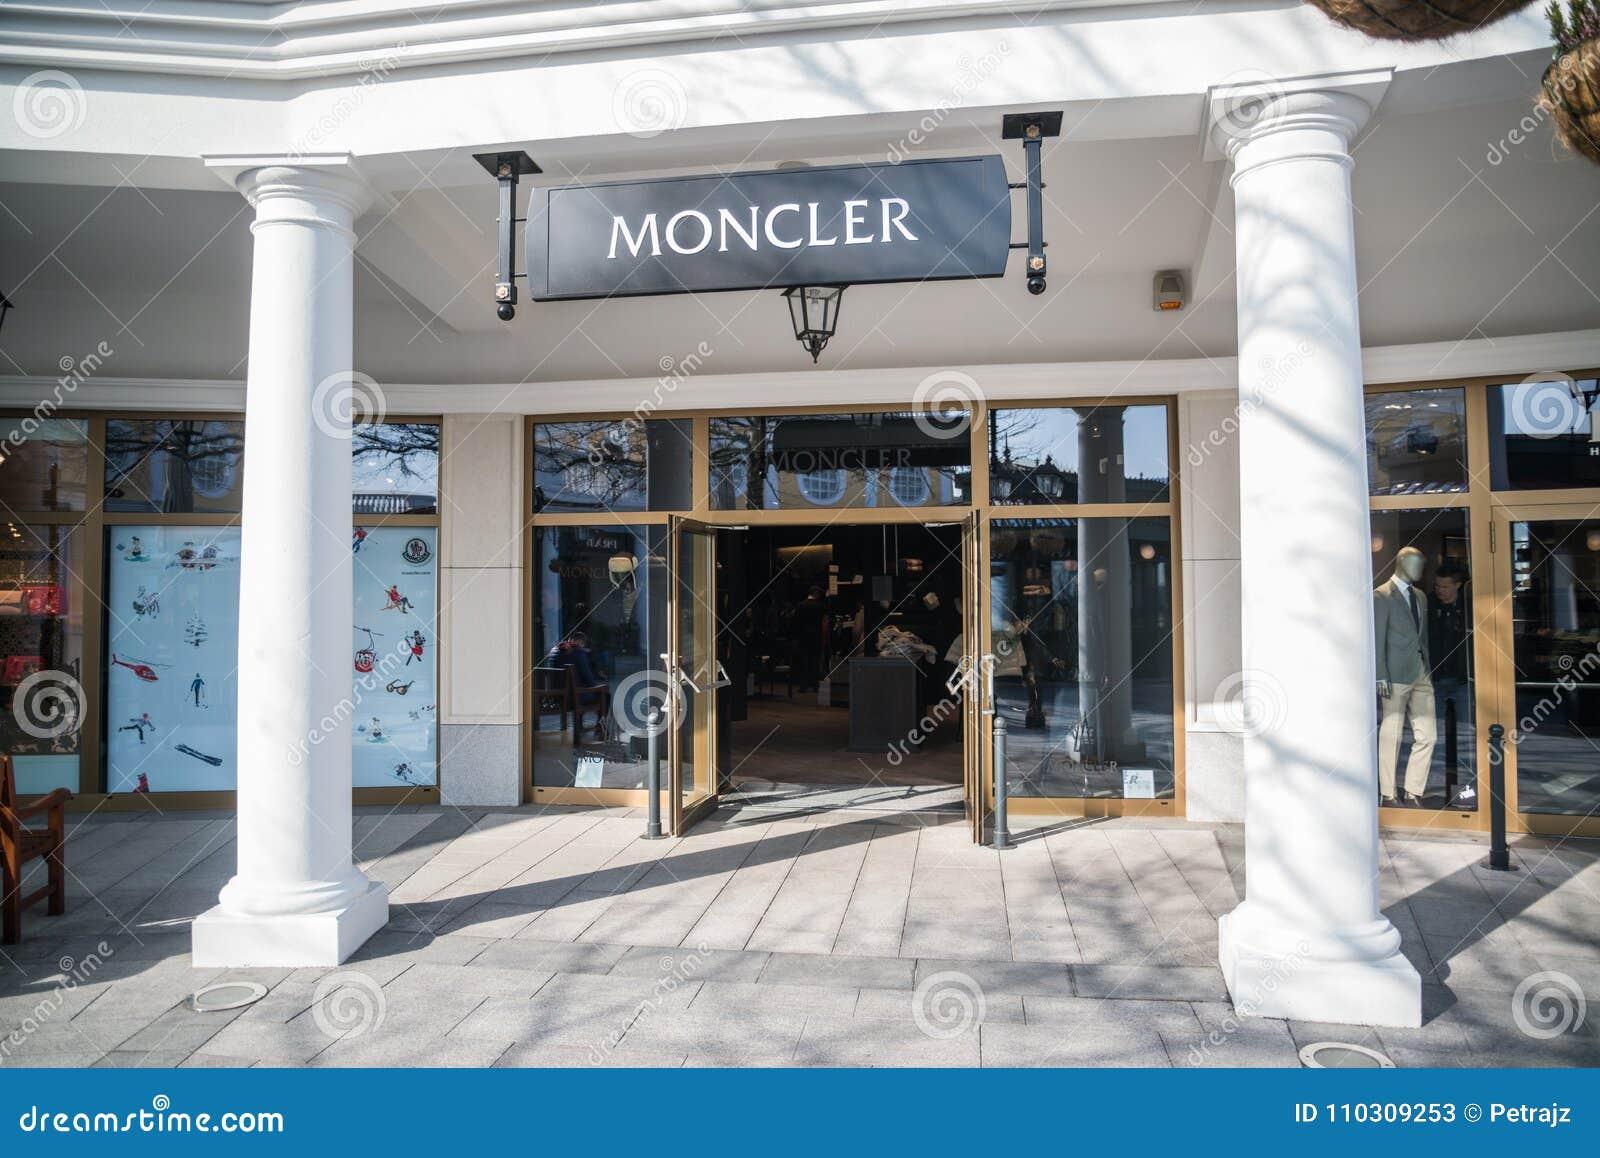 moncler azienda italiana